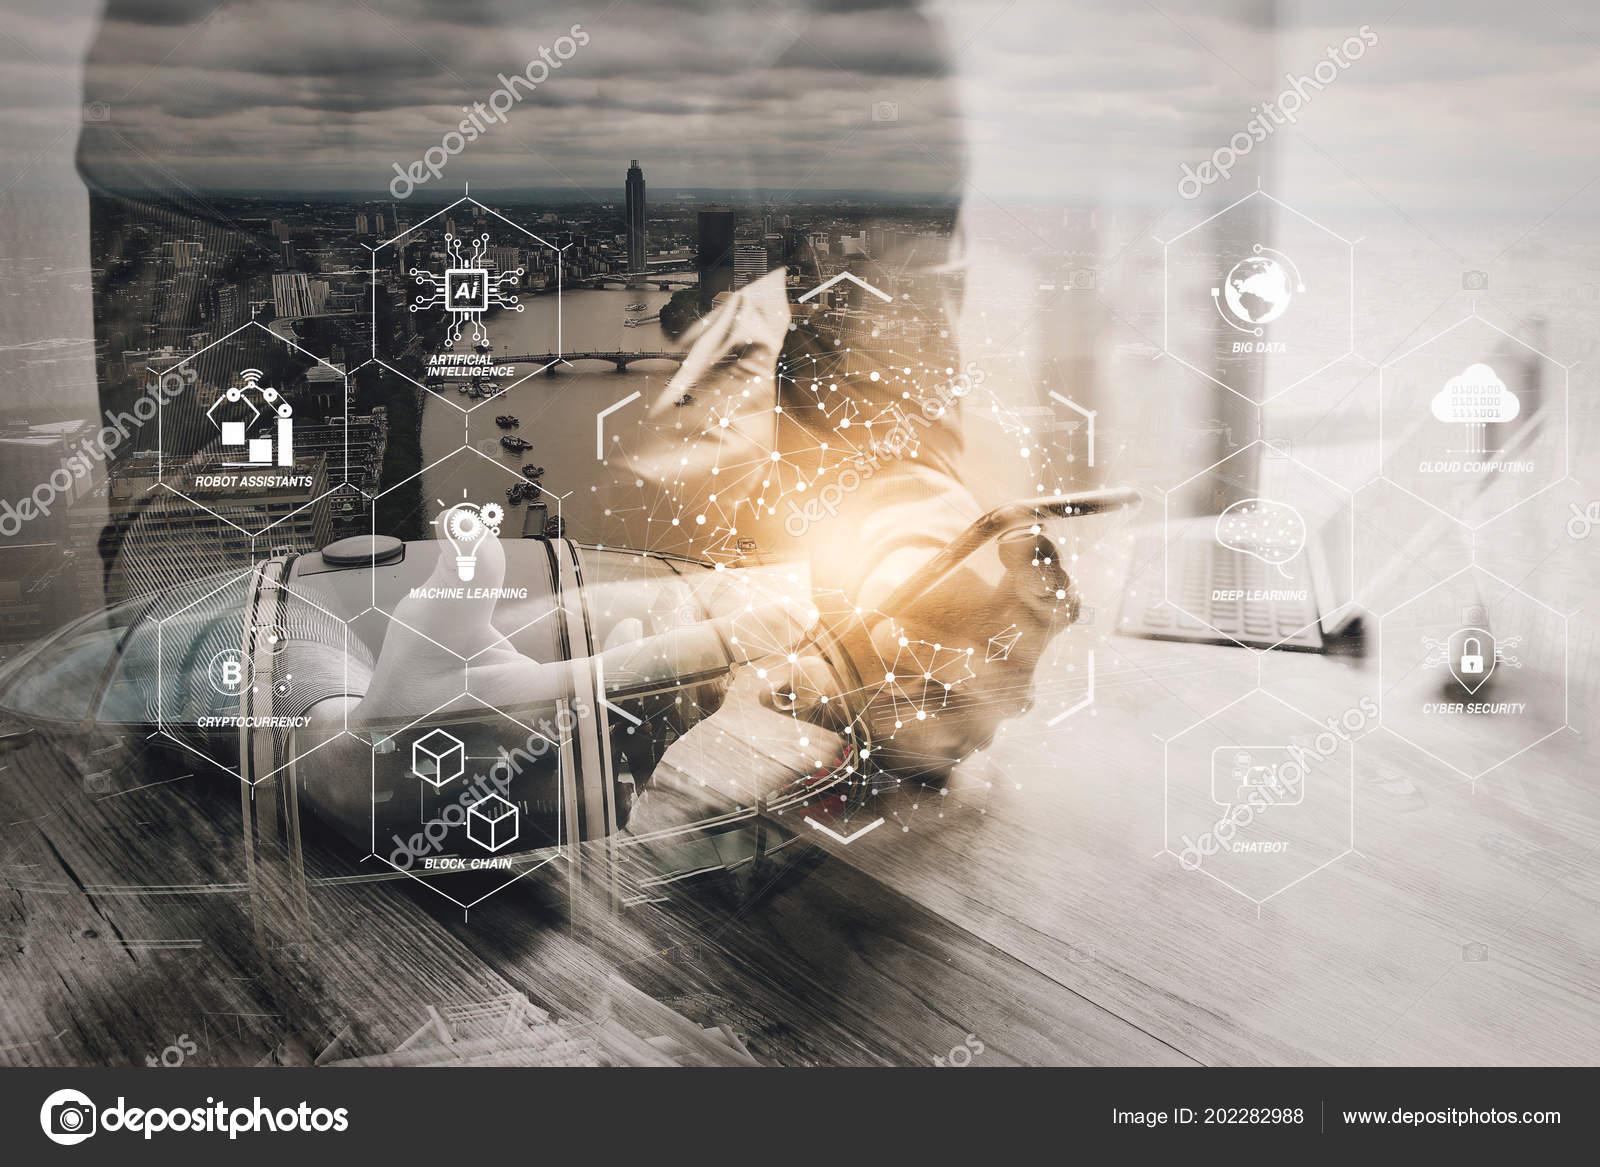 Futuristic industry business virtual diagram robot assistant cloud futuristic industry business virtual diagram robot assistant cloud big data stock photo ccuart Gallery